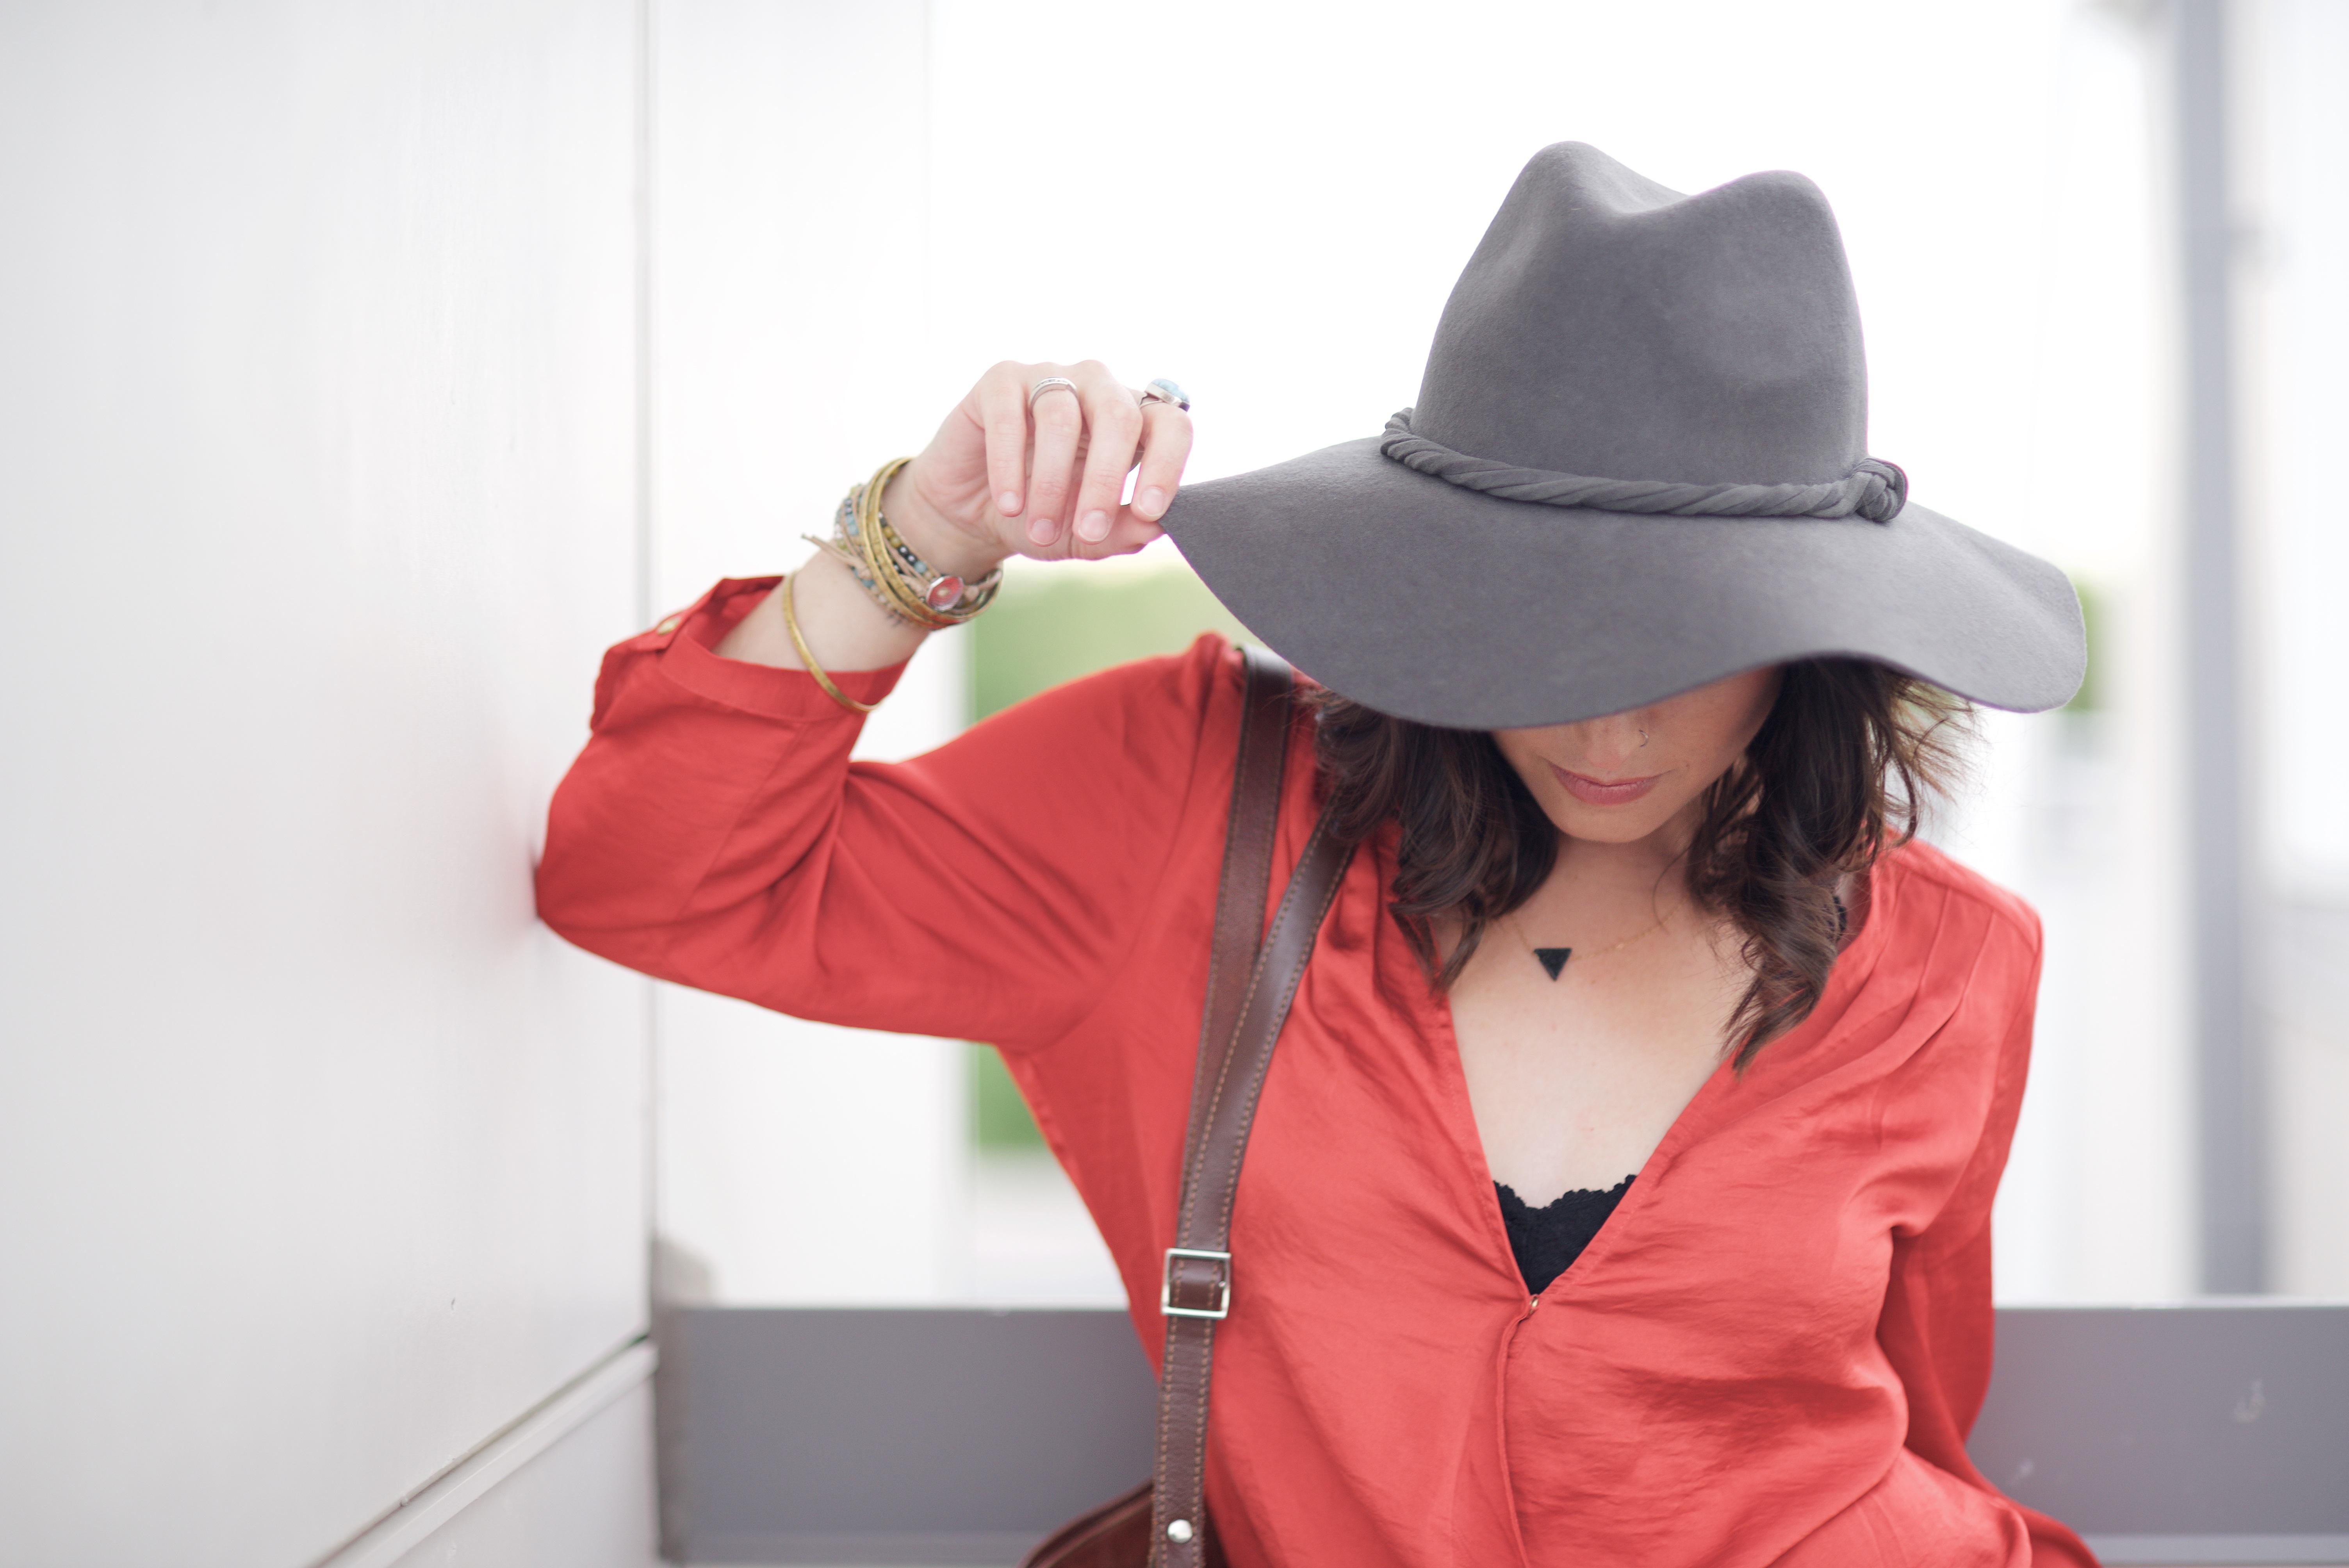 795d8e6397c γυναίκα καπέλο είδη ένδυσης κυρία ροζ κάλλυμα κεφαλής ενδύματα κολιέ  βραχιόλι καπάκι μαλακό καπέλλο αξεσουάρ μόδας